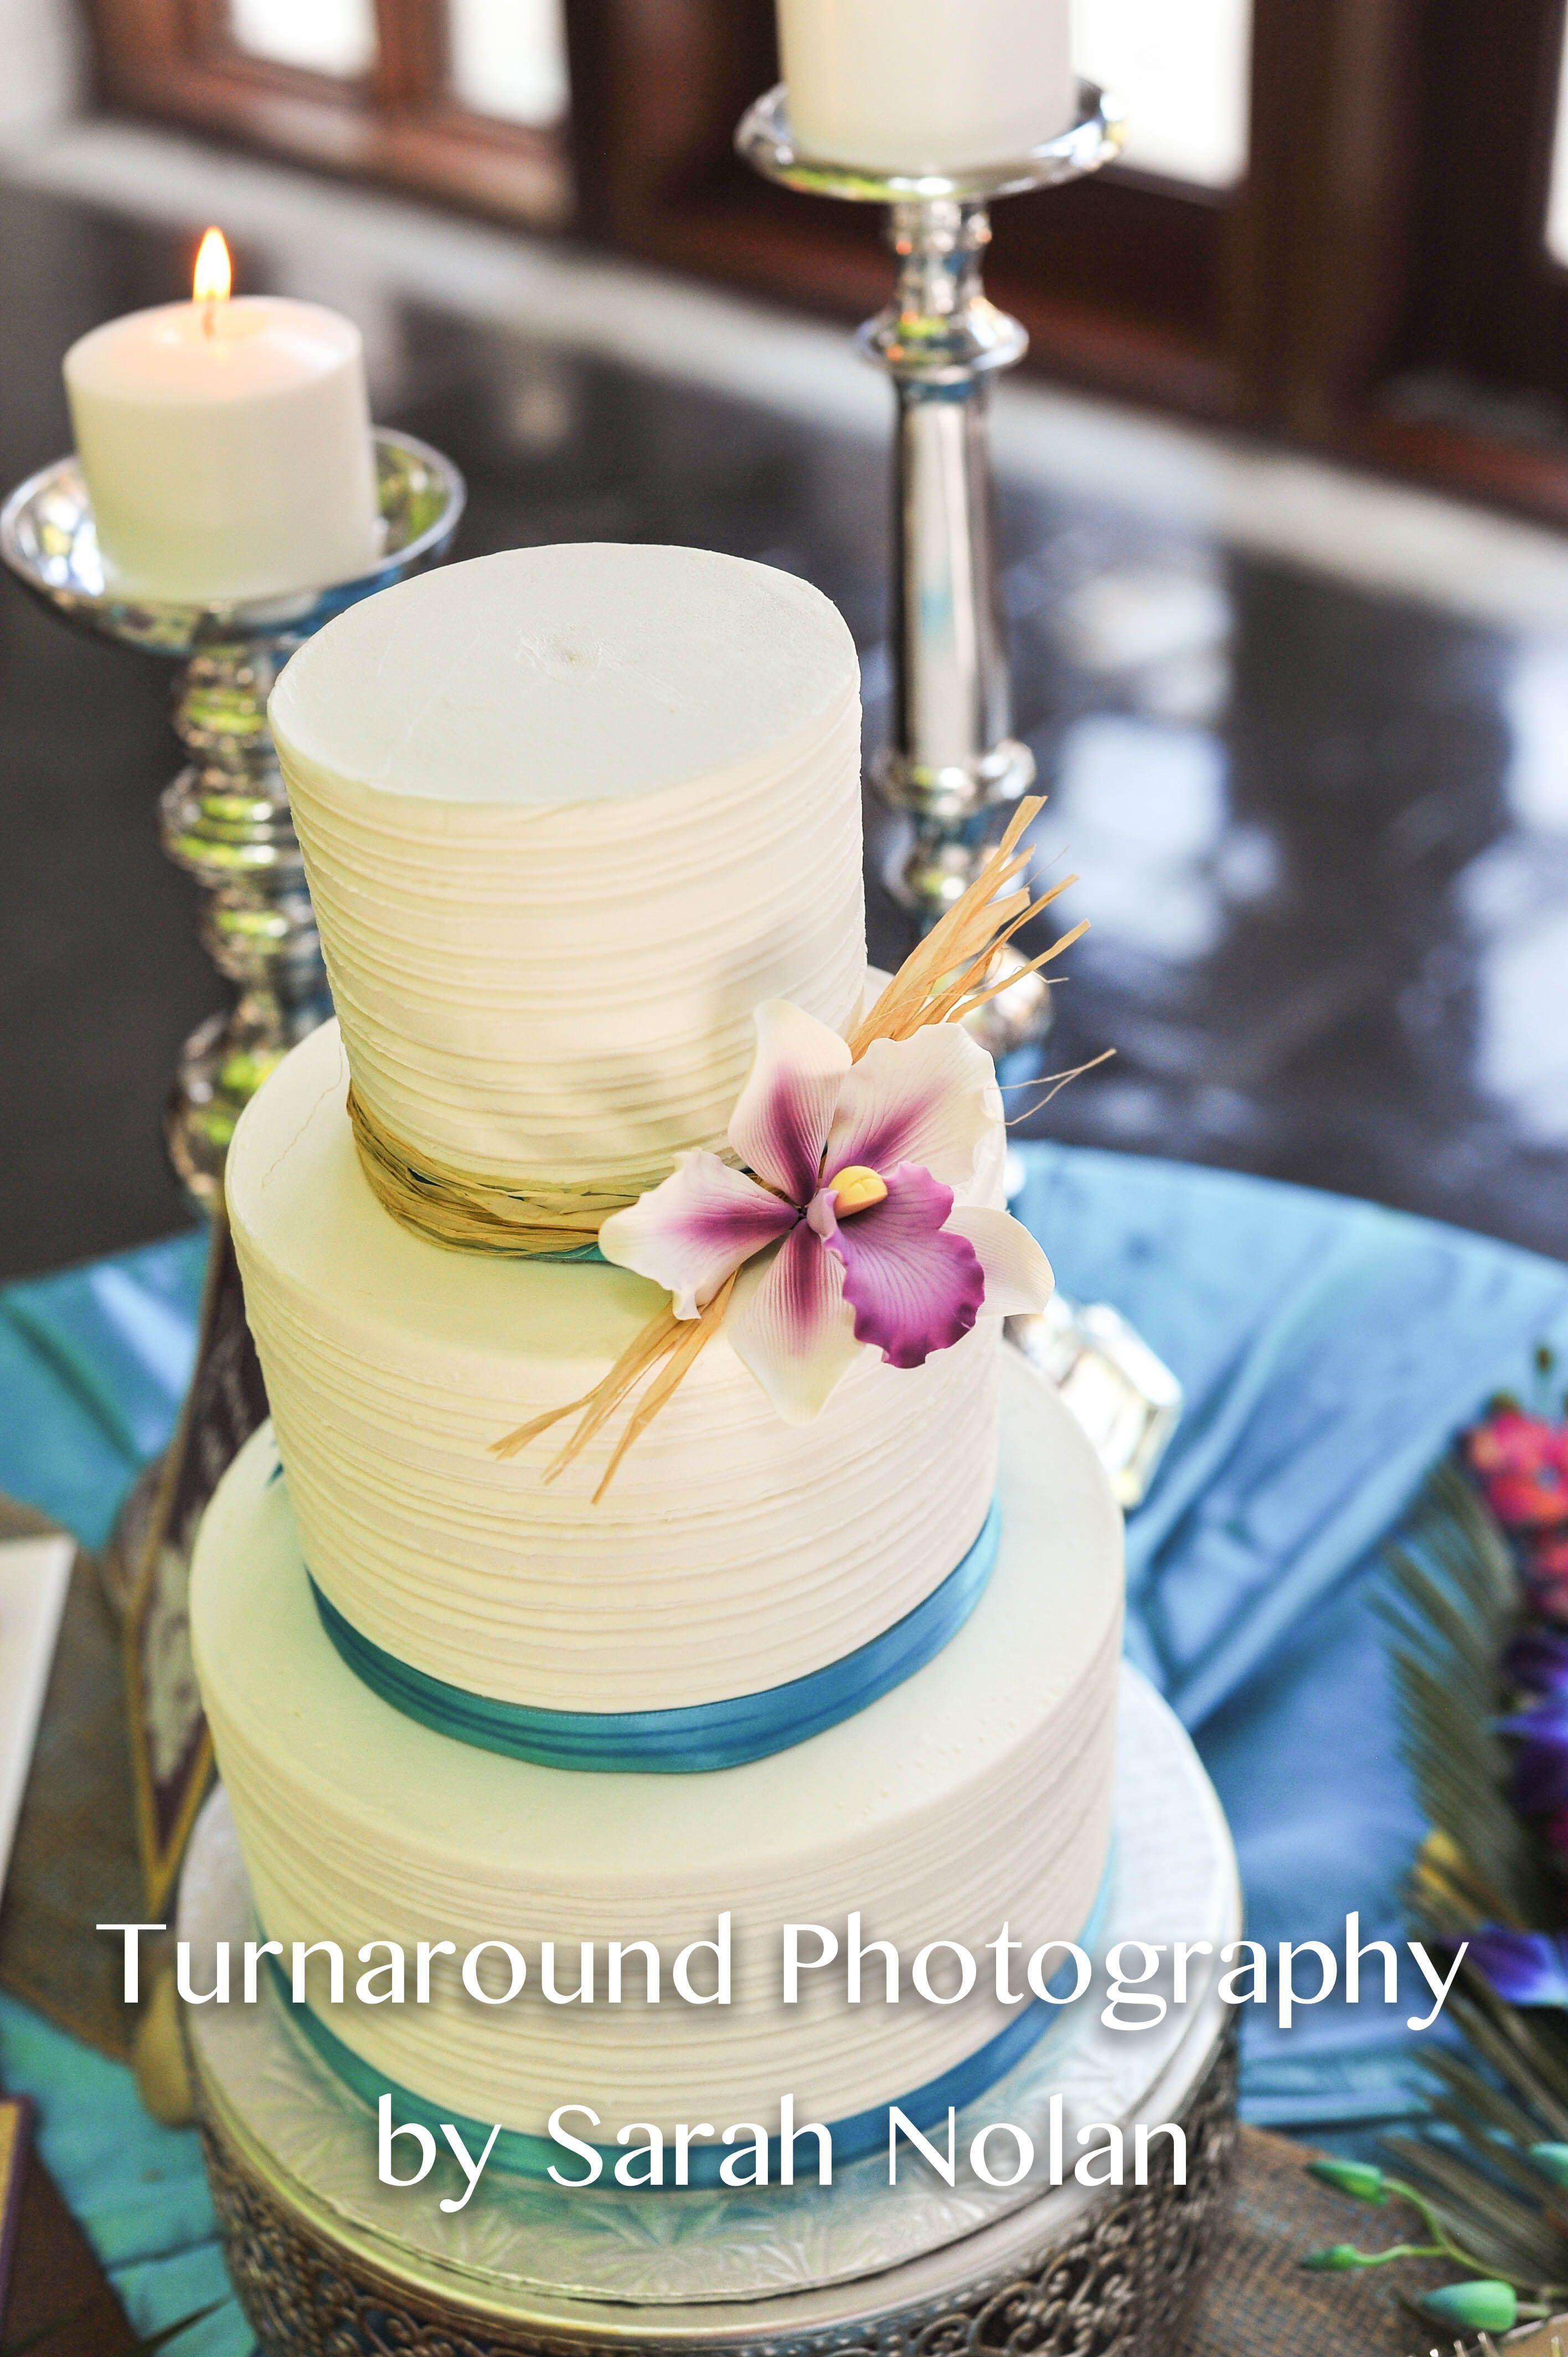 Amazing Aloha Themed Wedding Cake Virginia Beach Photography Turnaround